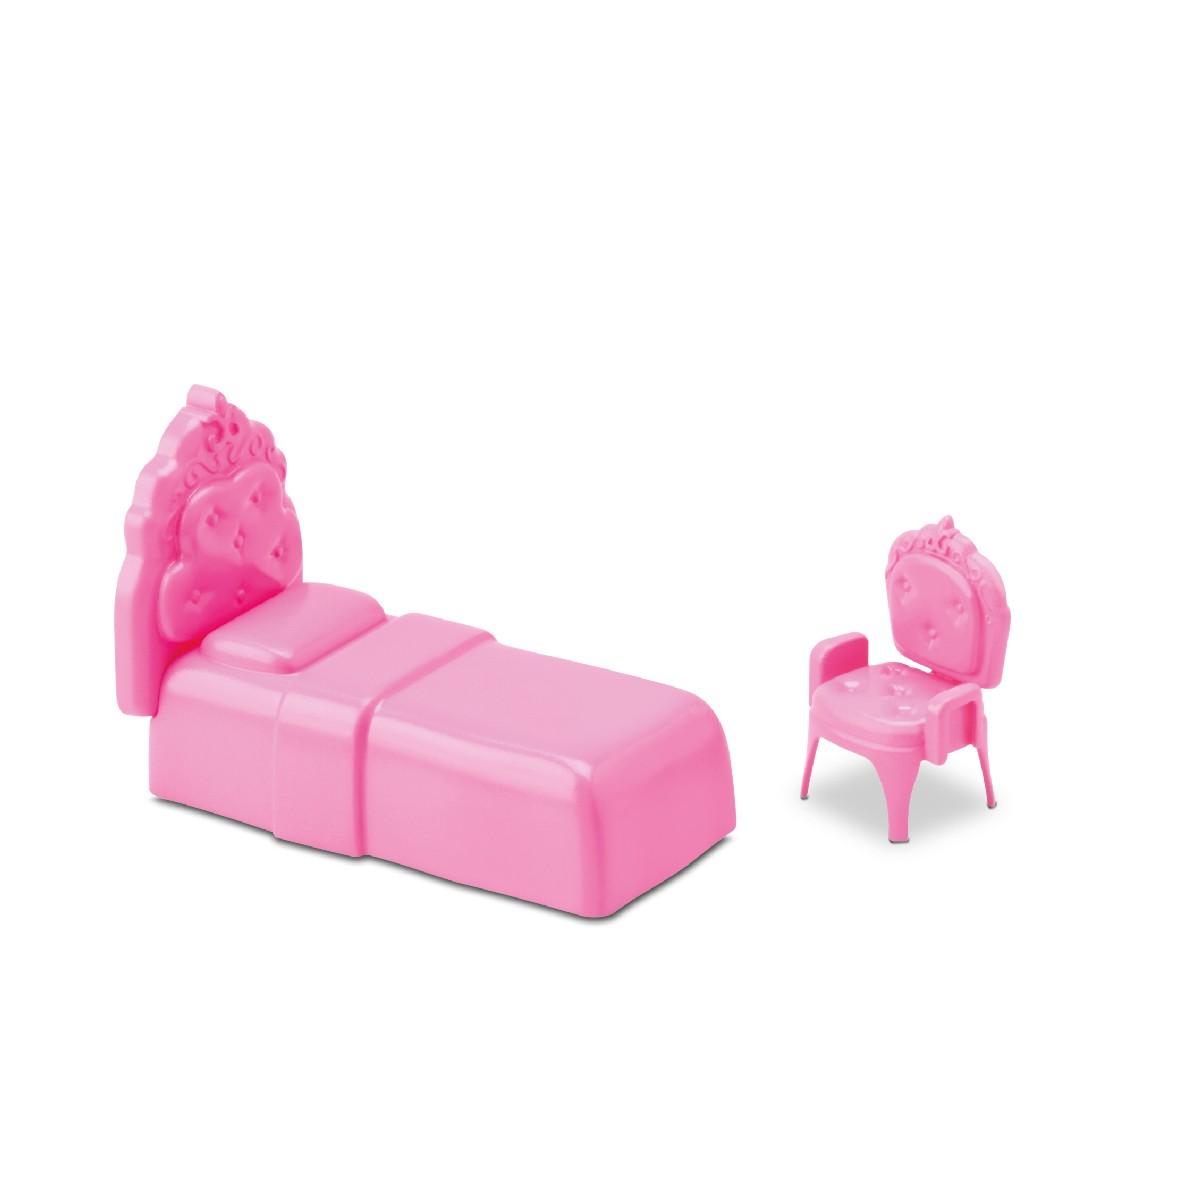 Castelo Princesa Judy Samba Toys Brinquedo